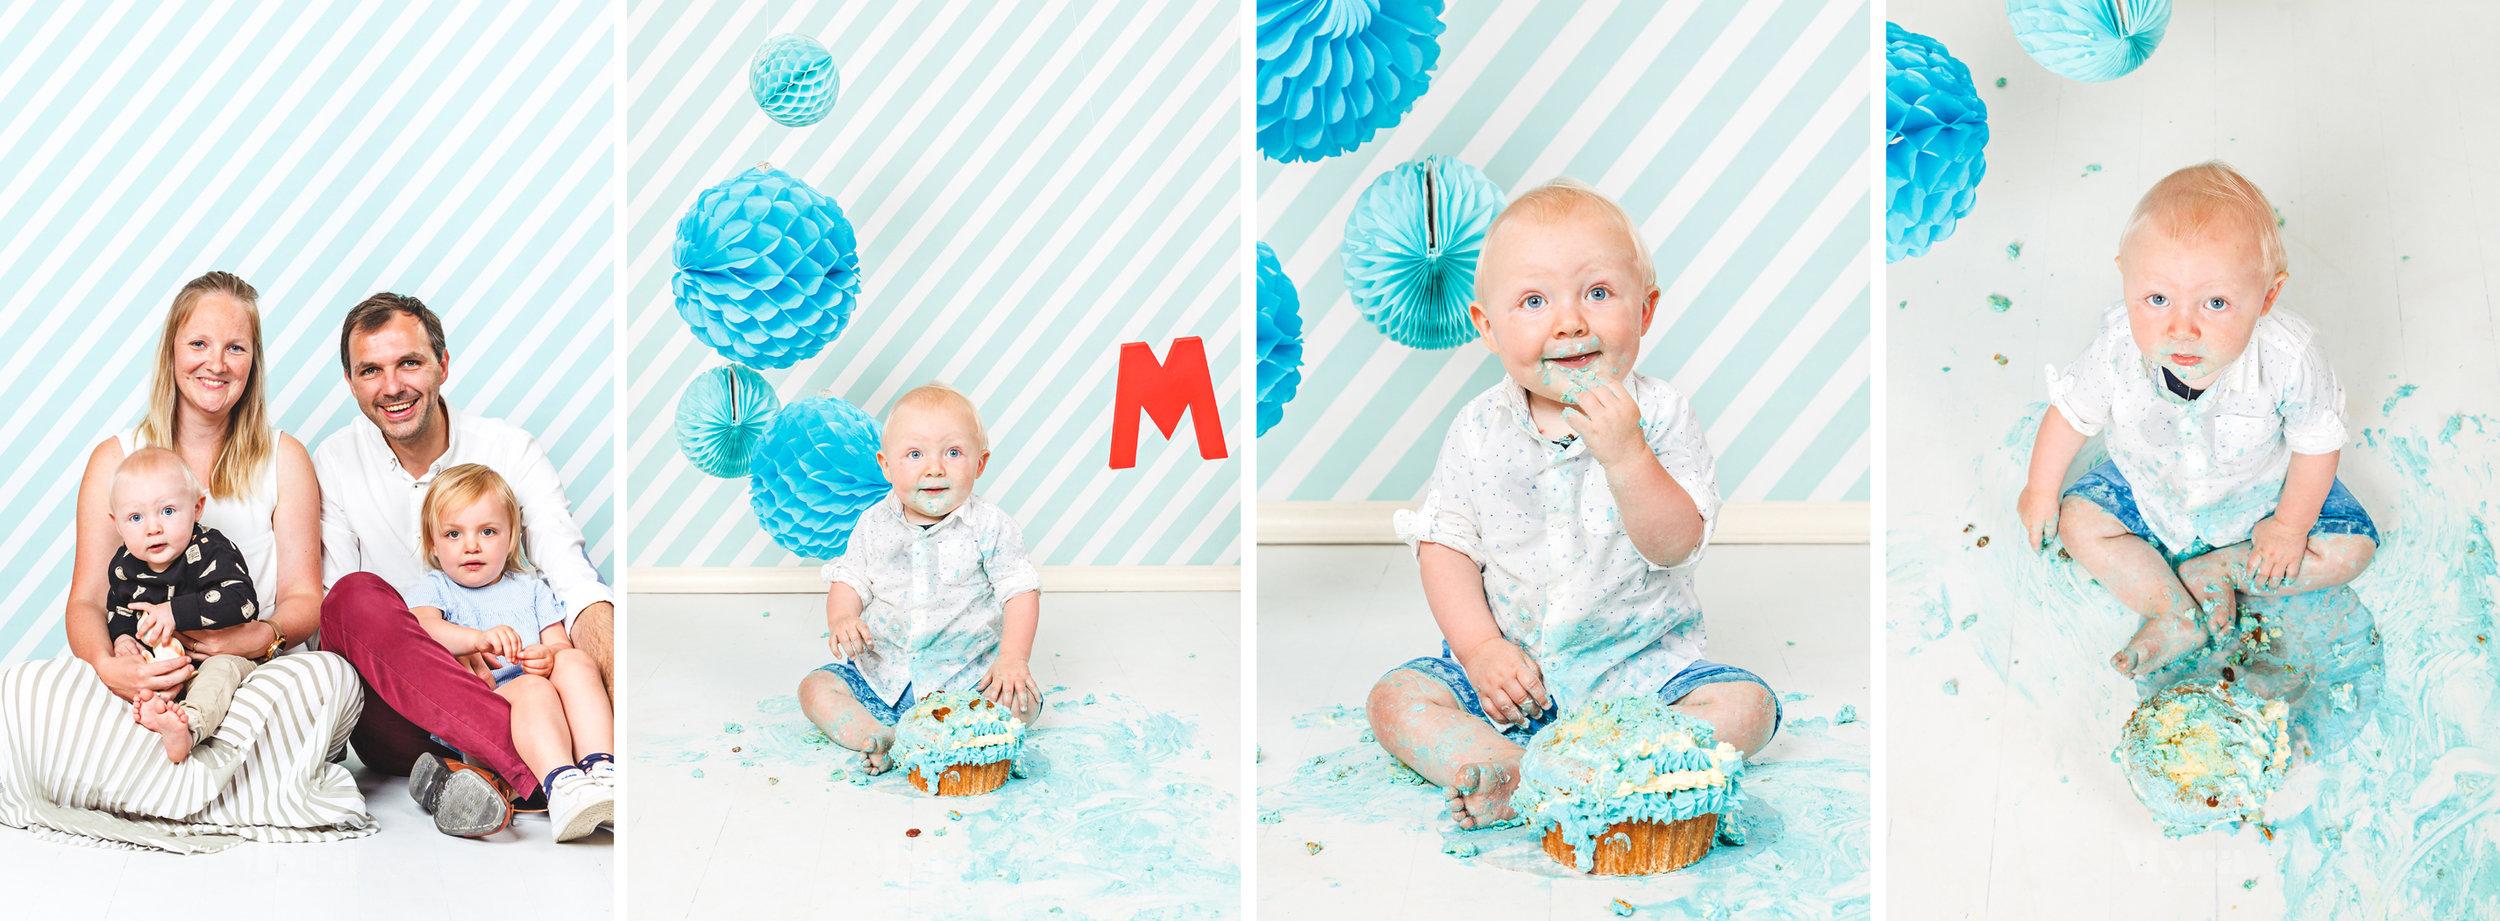 cakesmash mathieu collage.jpg